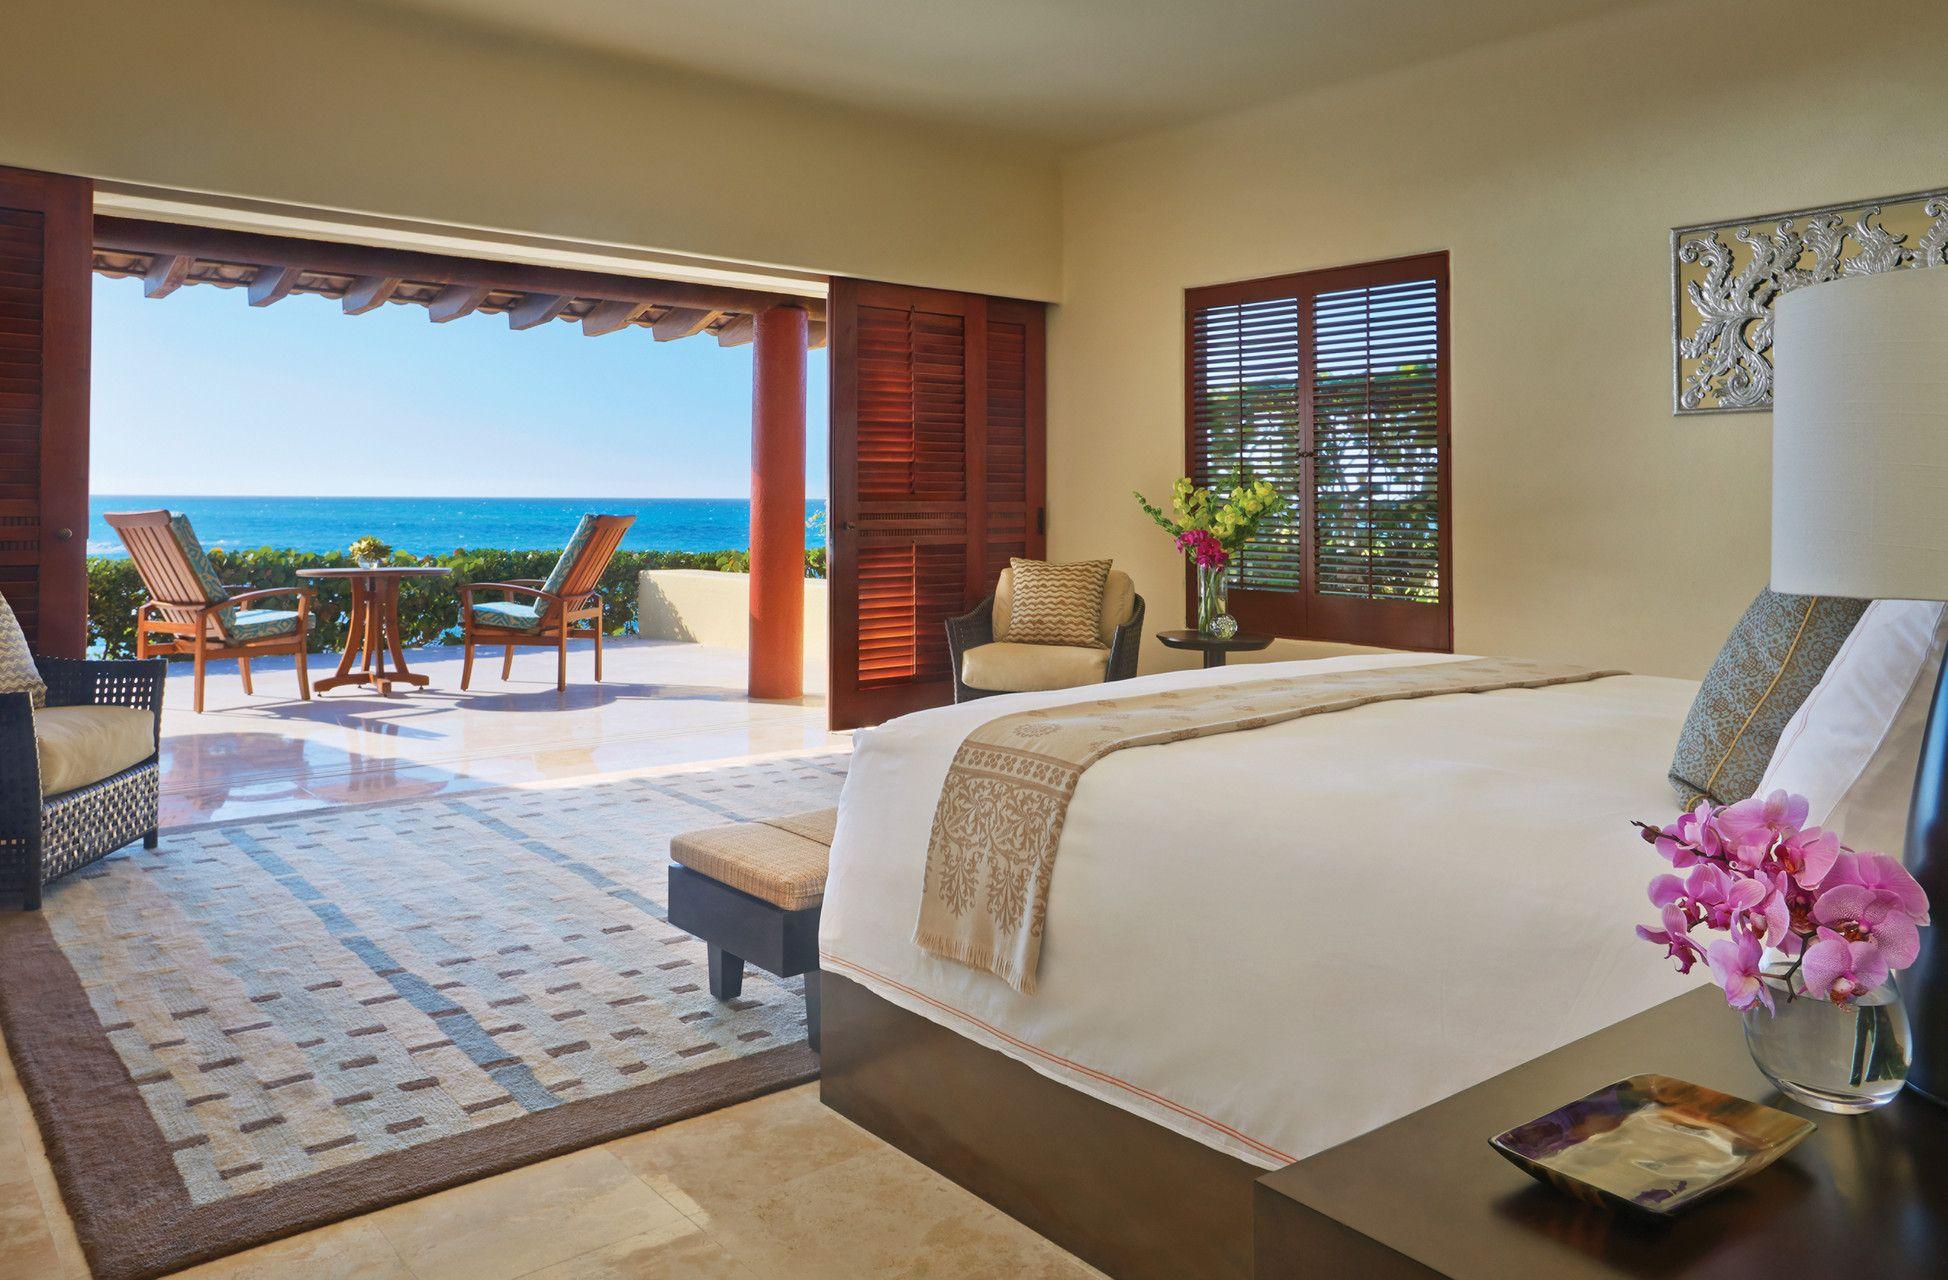 This Is What We Call Heaven Four Seasons Resort Punta Mita Hotel Luxury Hotel Resort